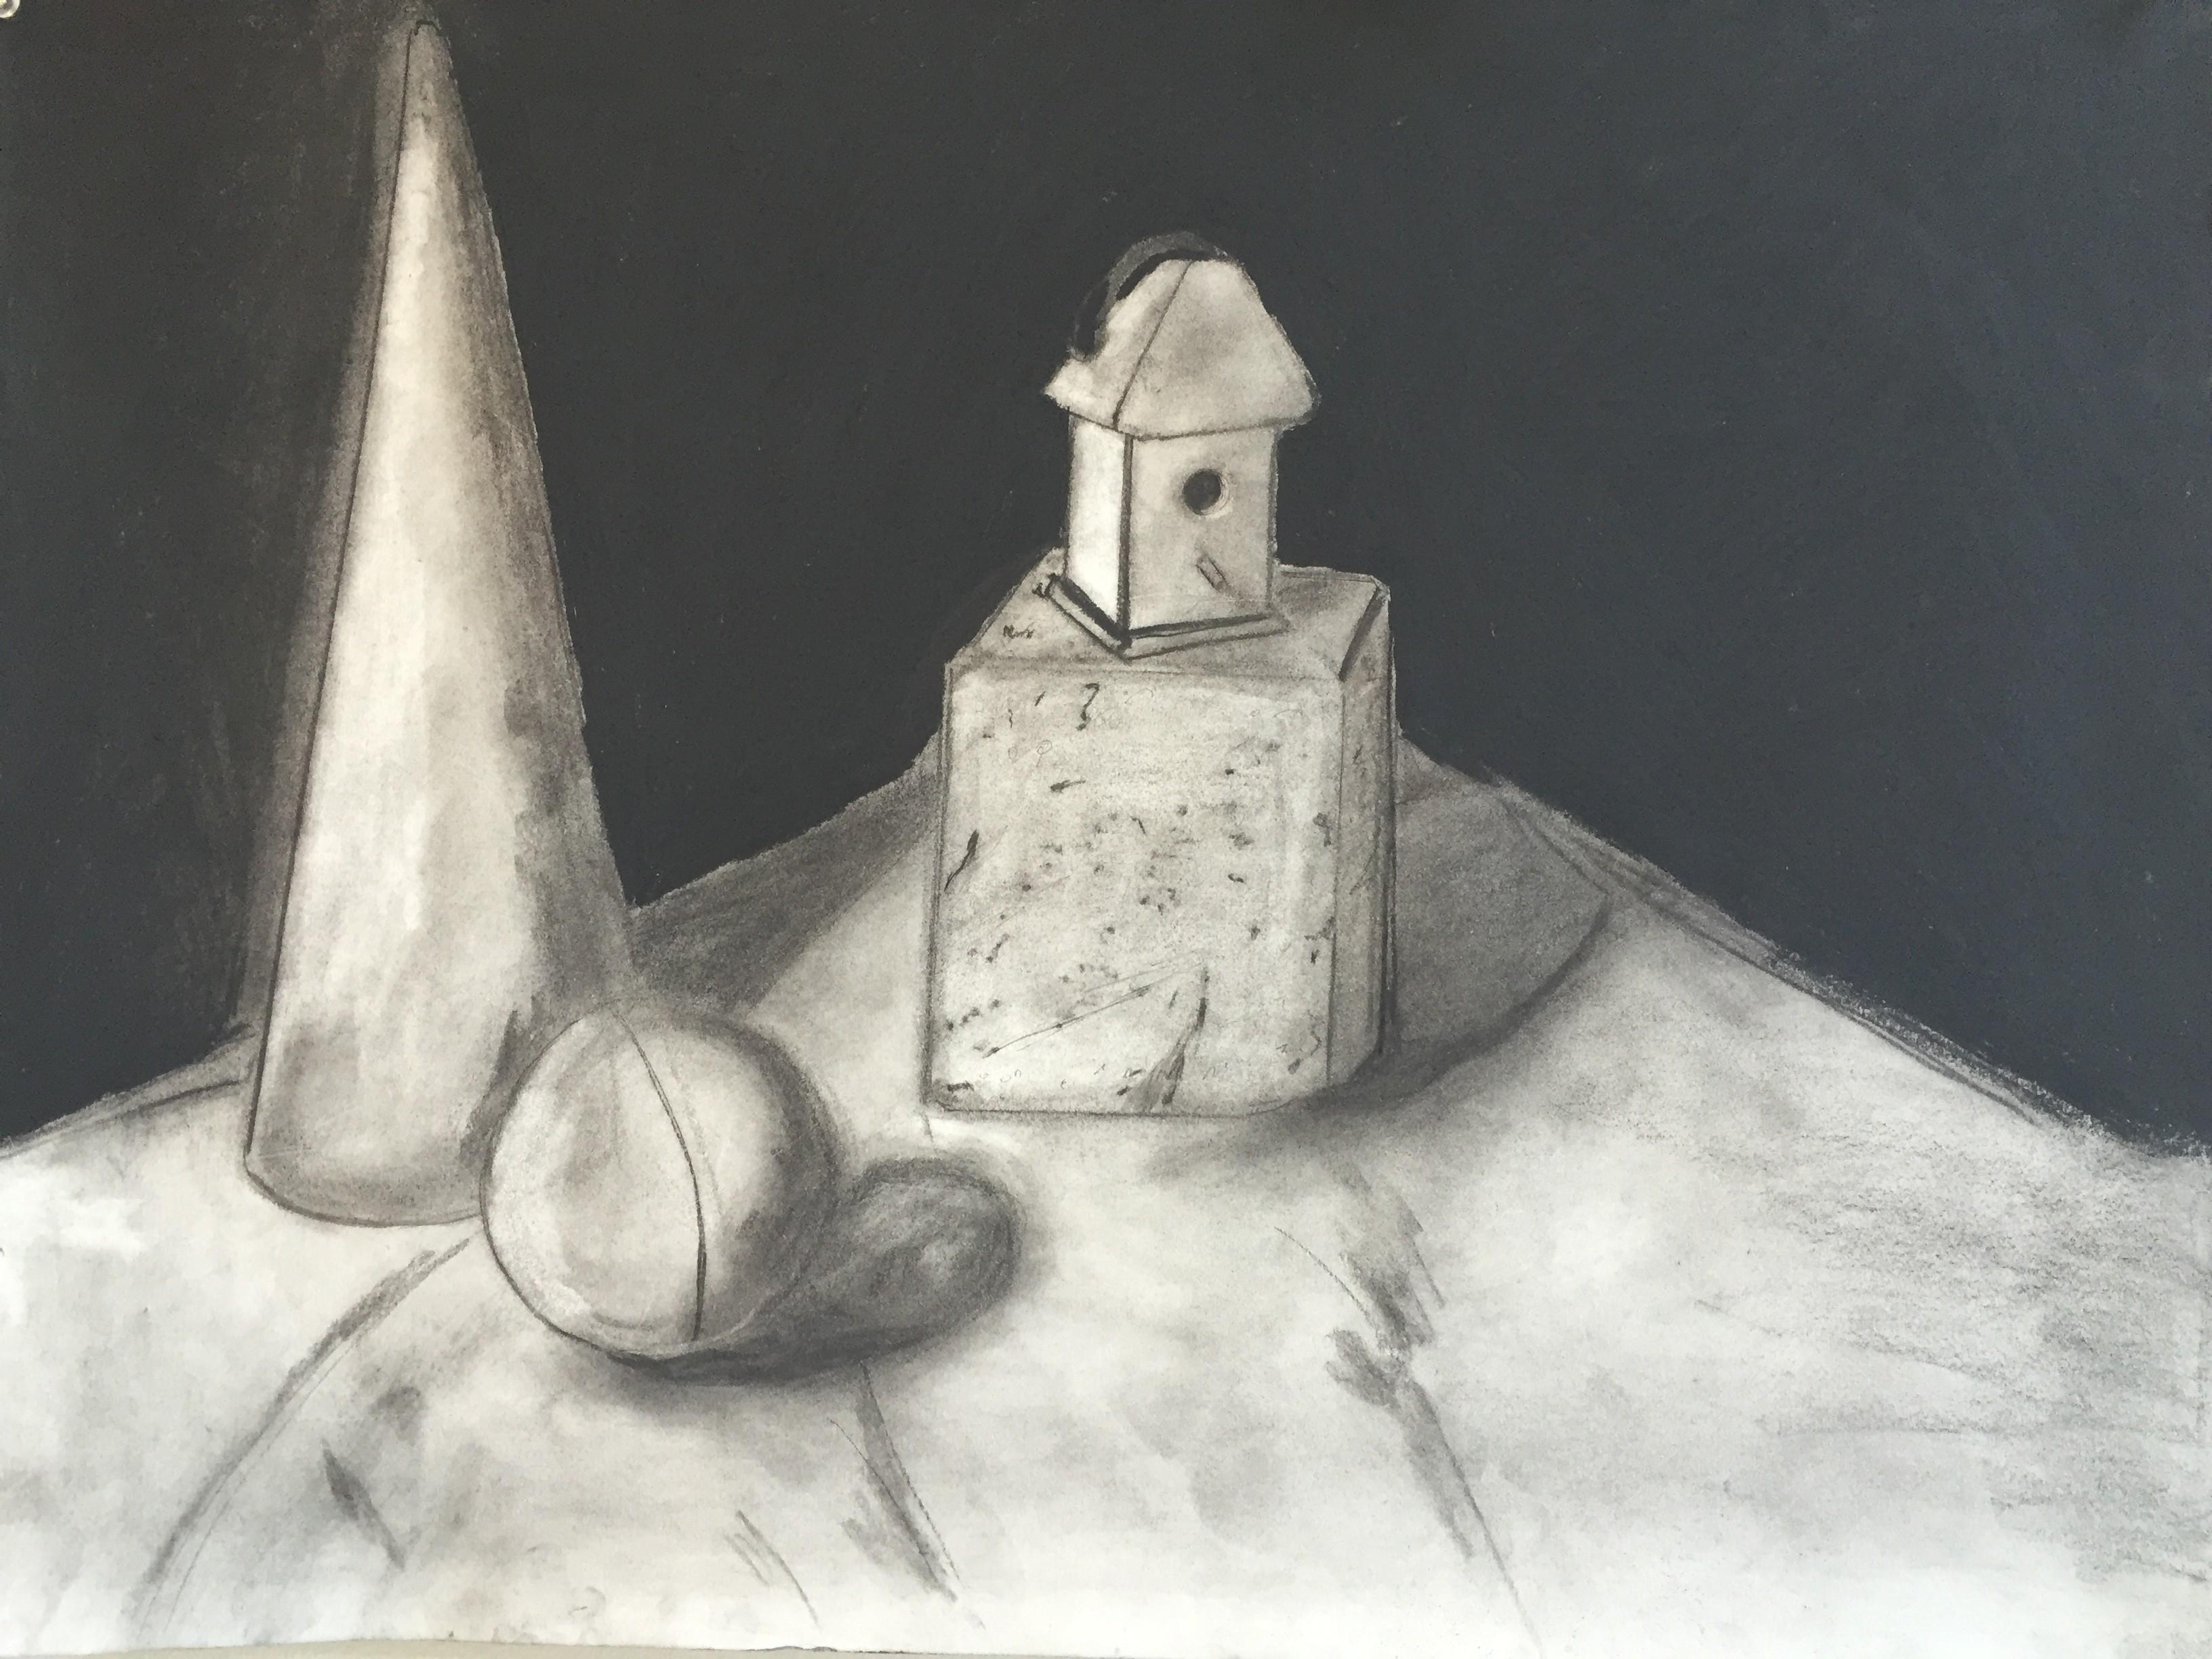 Geometrical Studies in Charcoal: Part I